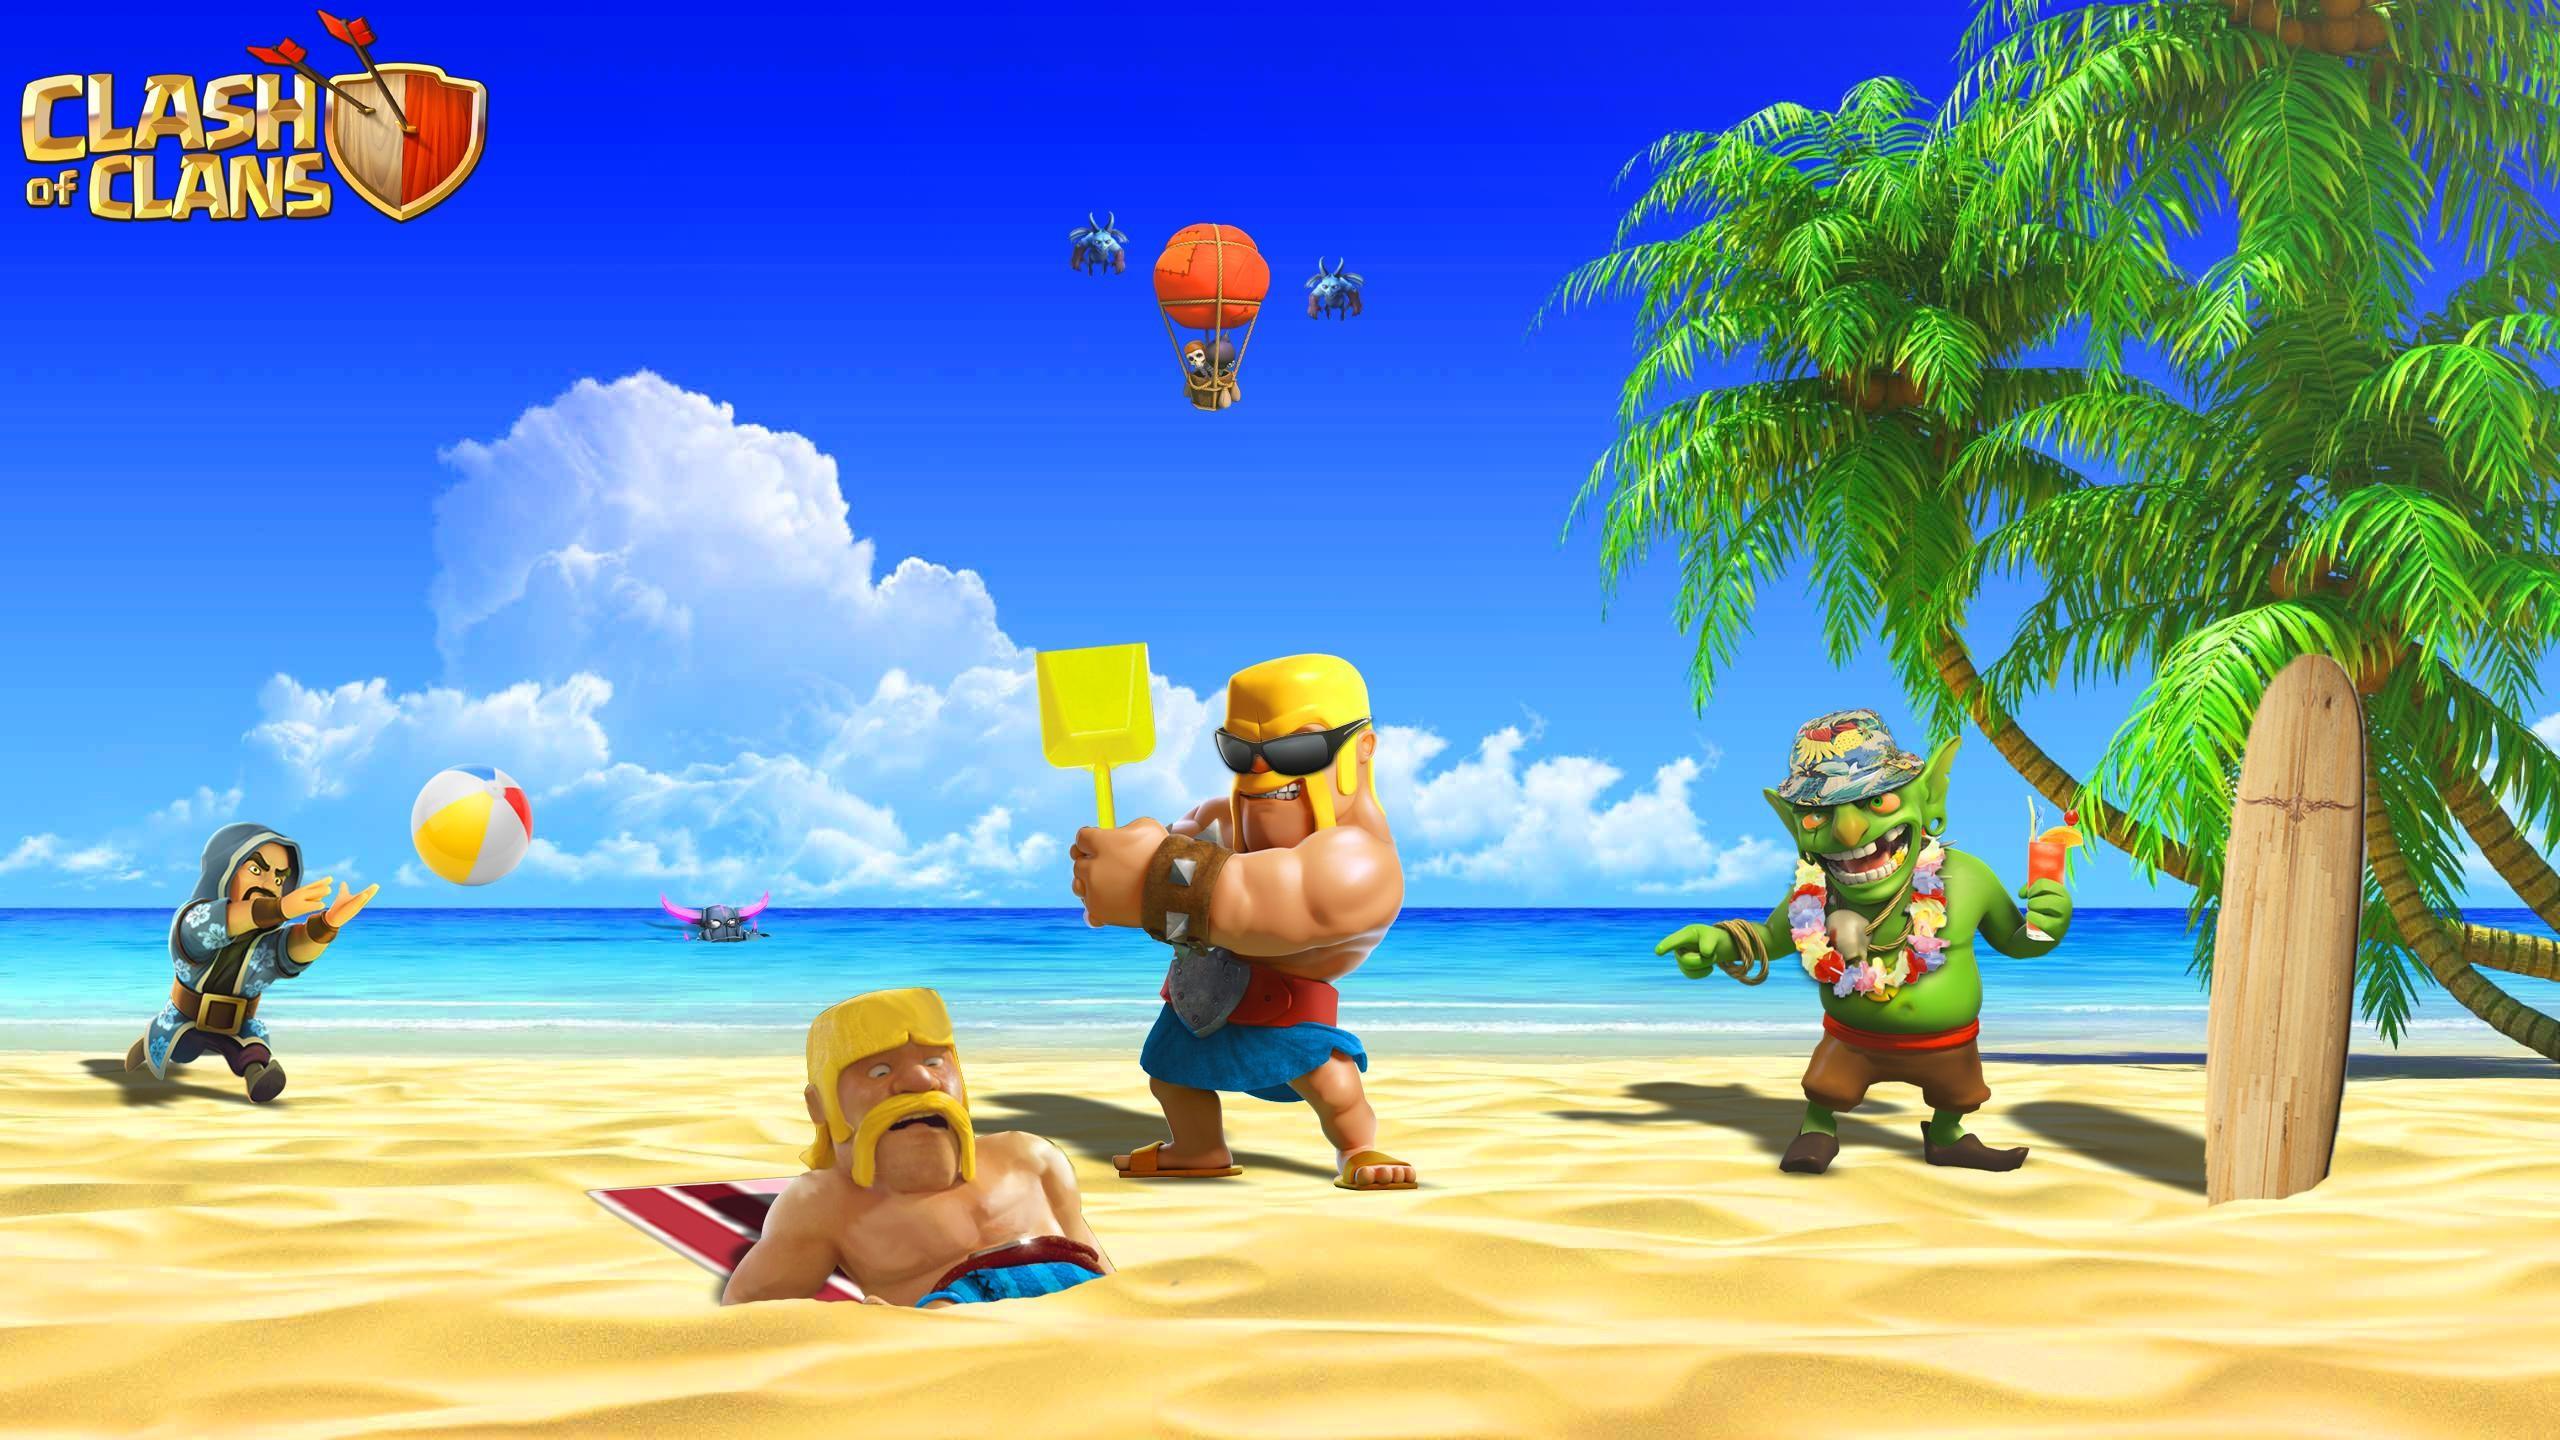 Funny Clash of Clans Barbarian Wallpaper–www.mobilga.com